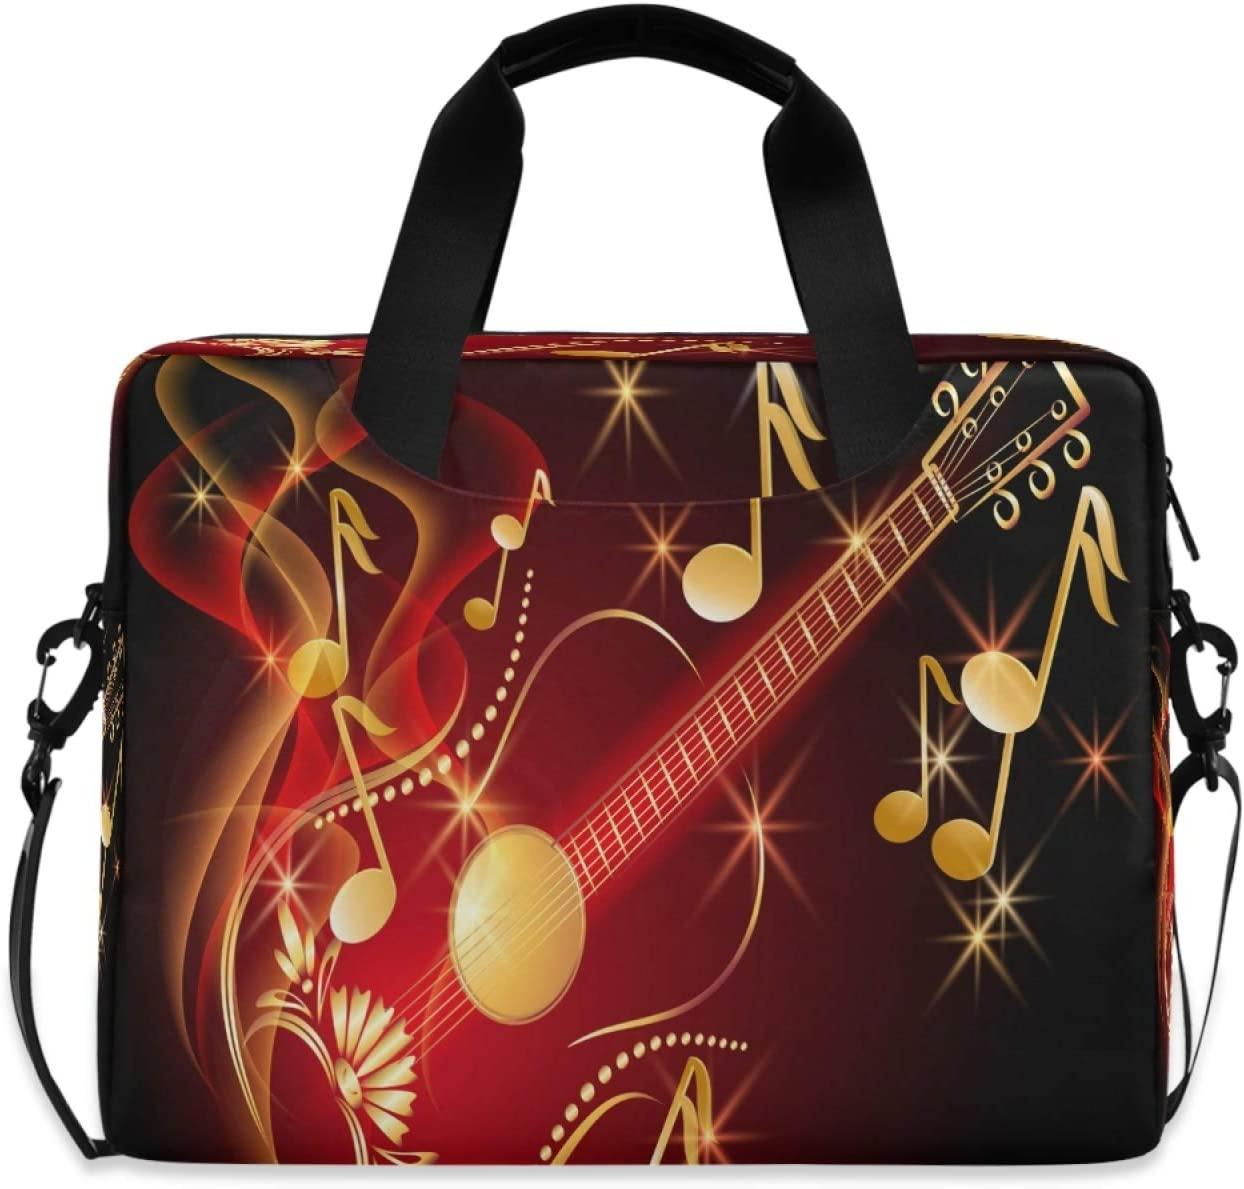 Yulife Japanese Guitar Musical Notes Laptop Bag Sleeve Case for Women Men Shiny Music Briefcase Tablet Messenger Shoulder Bag with Strap Notebook Computer Case 14 15.6 16 Inch for Kids Girls Business